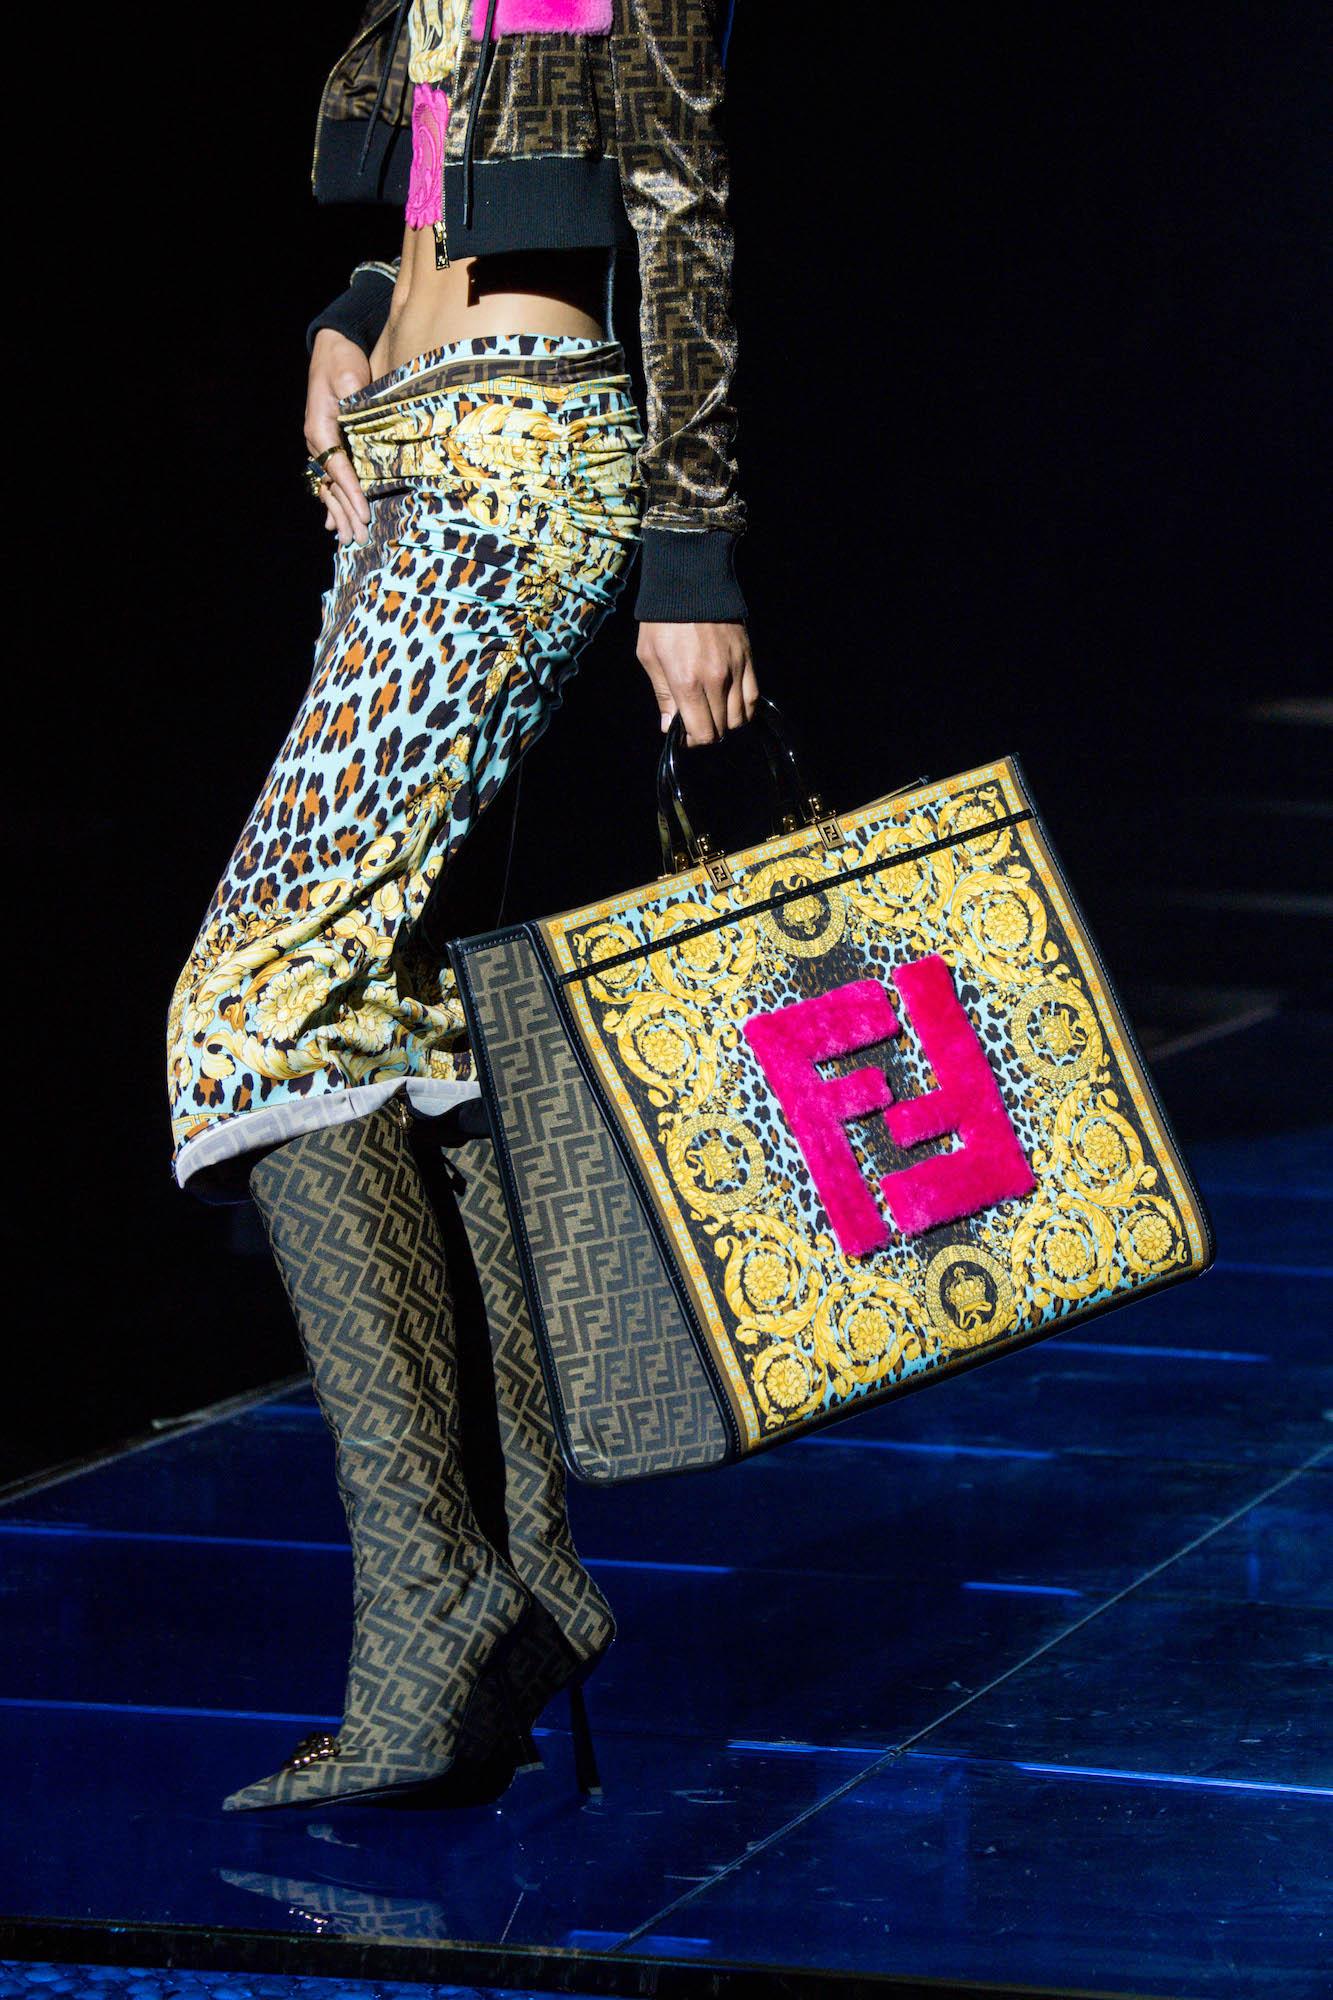 fendi by versace details (30)